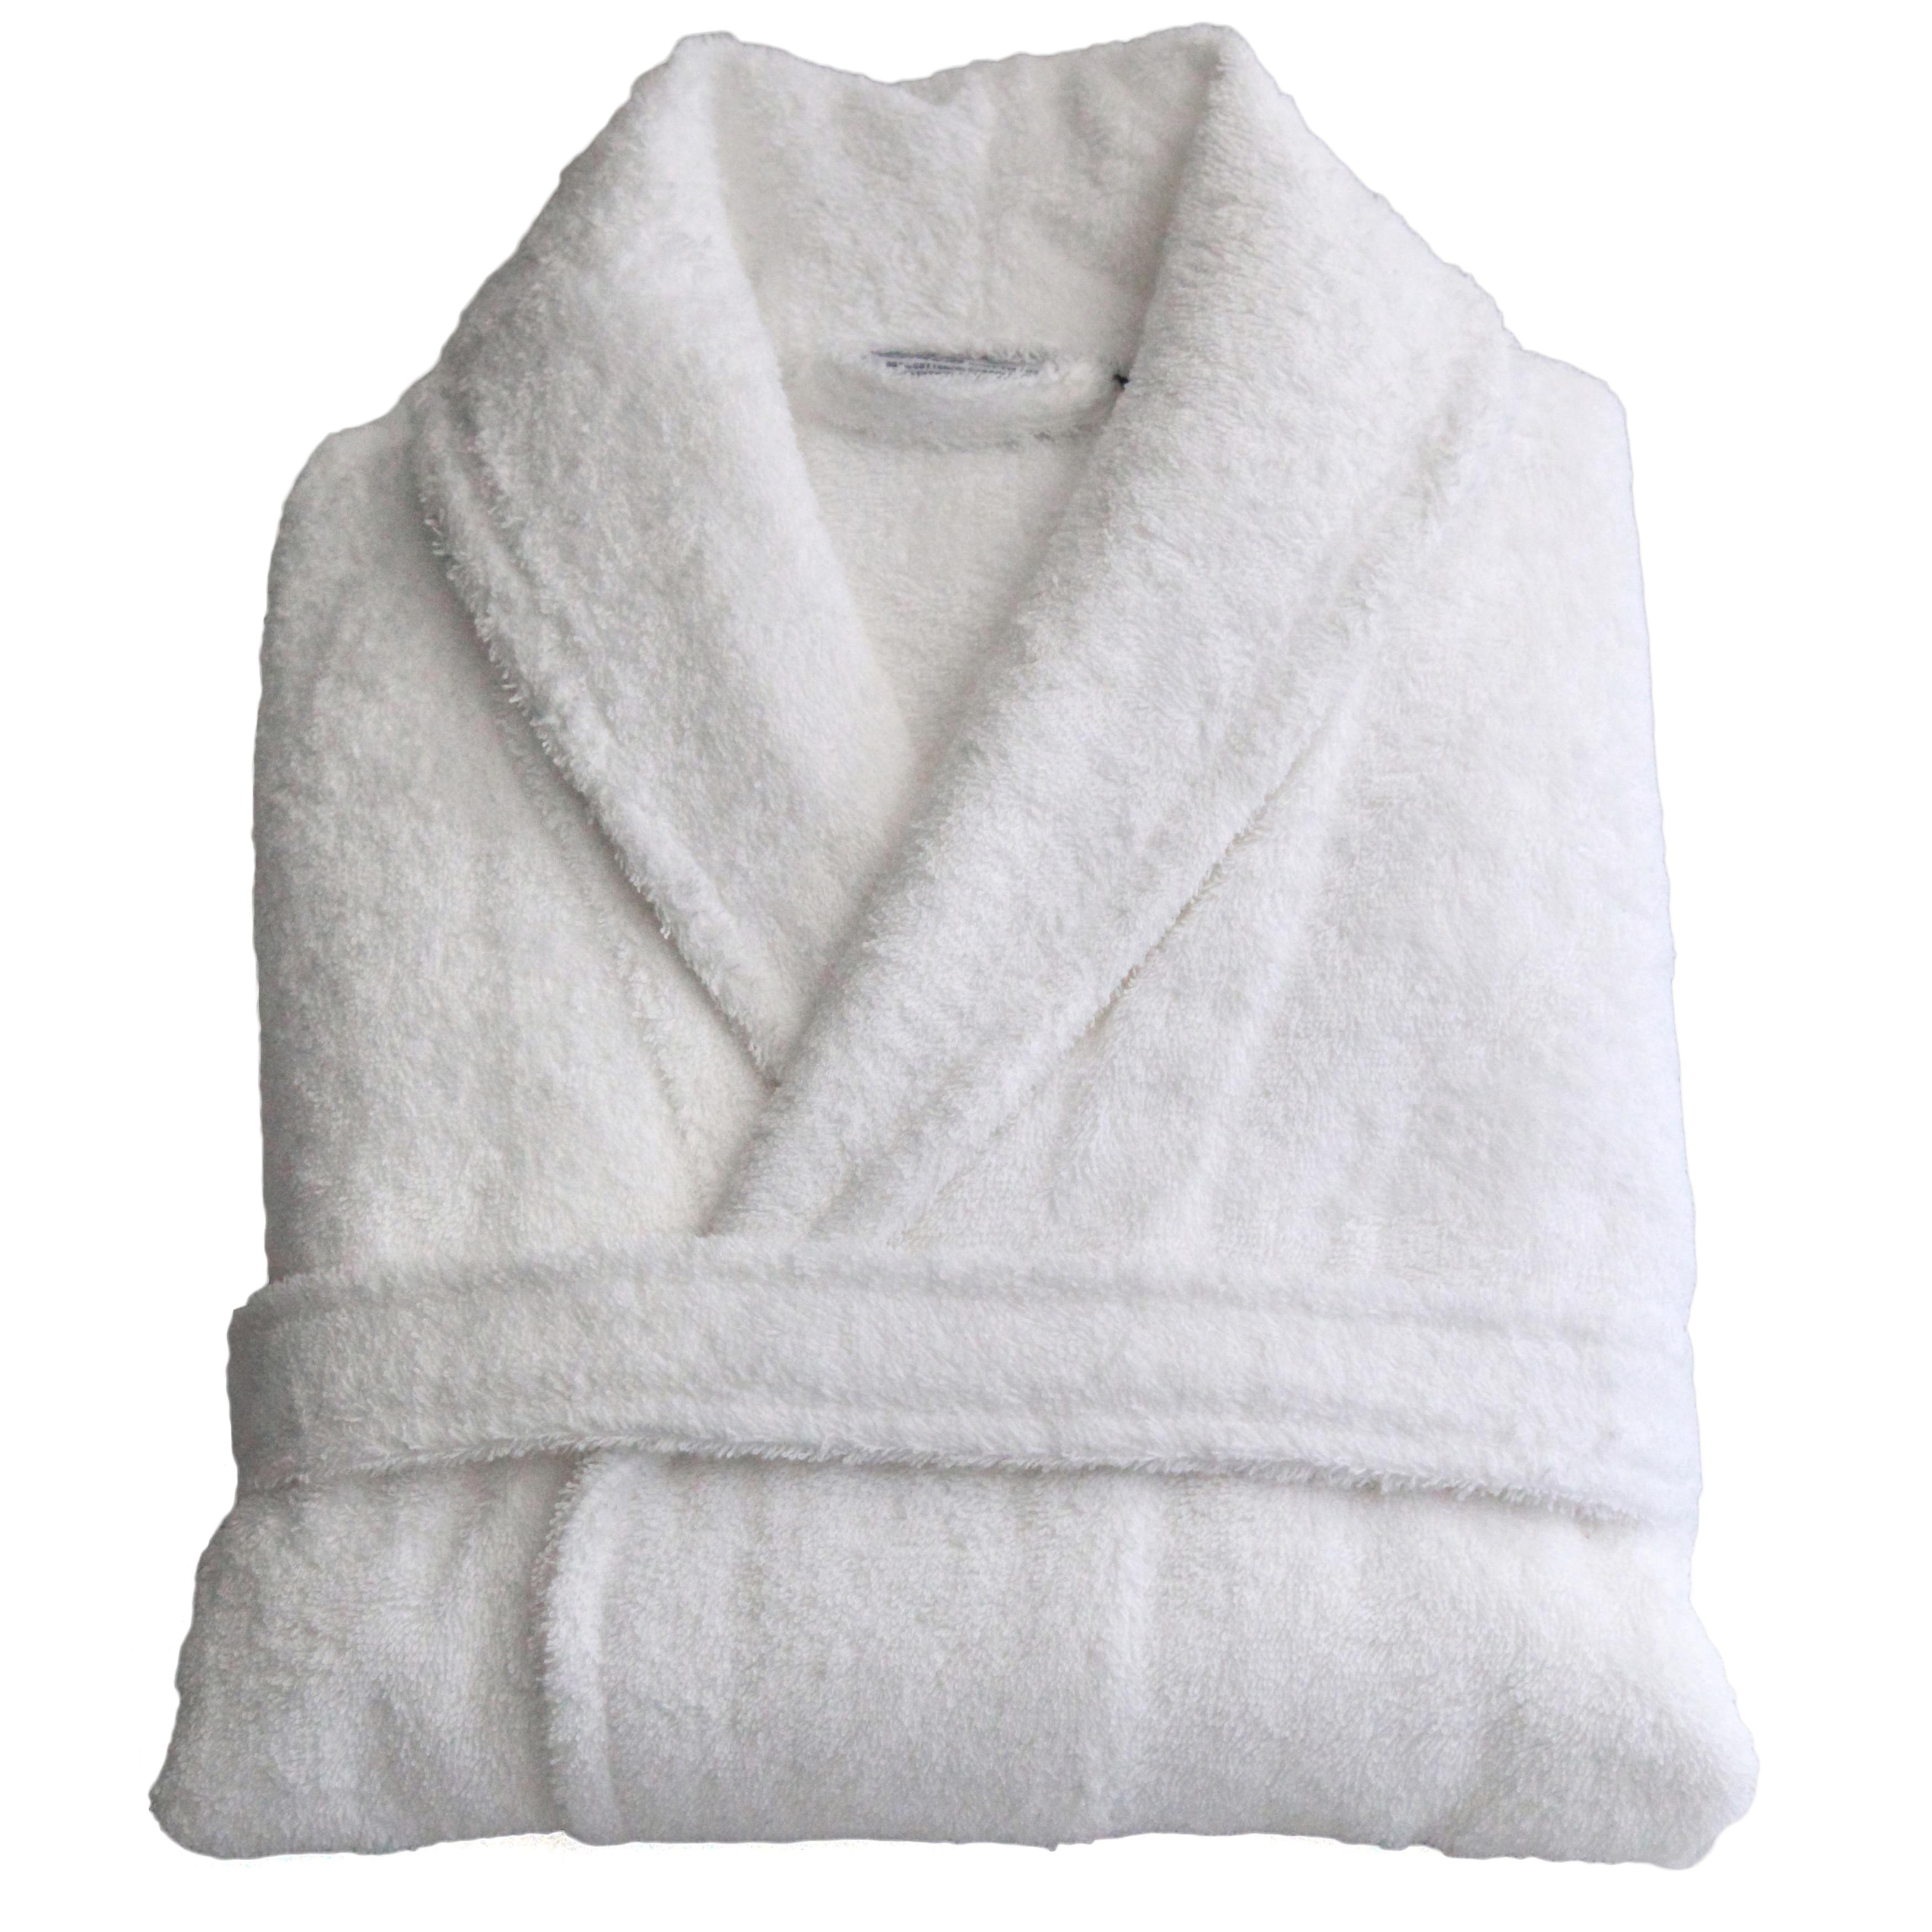 authentic hotel spa unisex turkish cotton terry cloth bath robe ebay. Black Bedroom Furniture Sets. Home Design Ideas